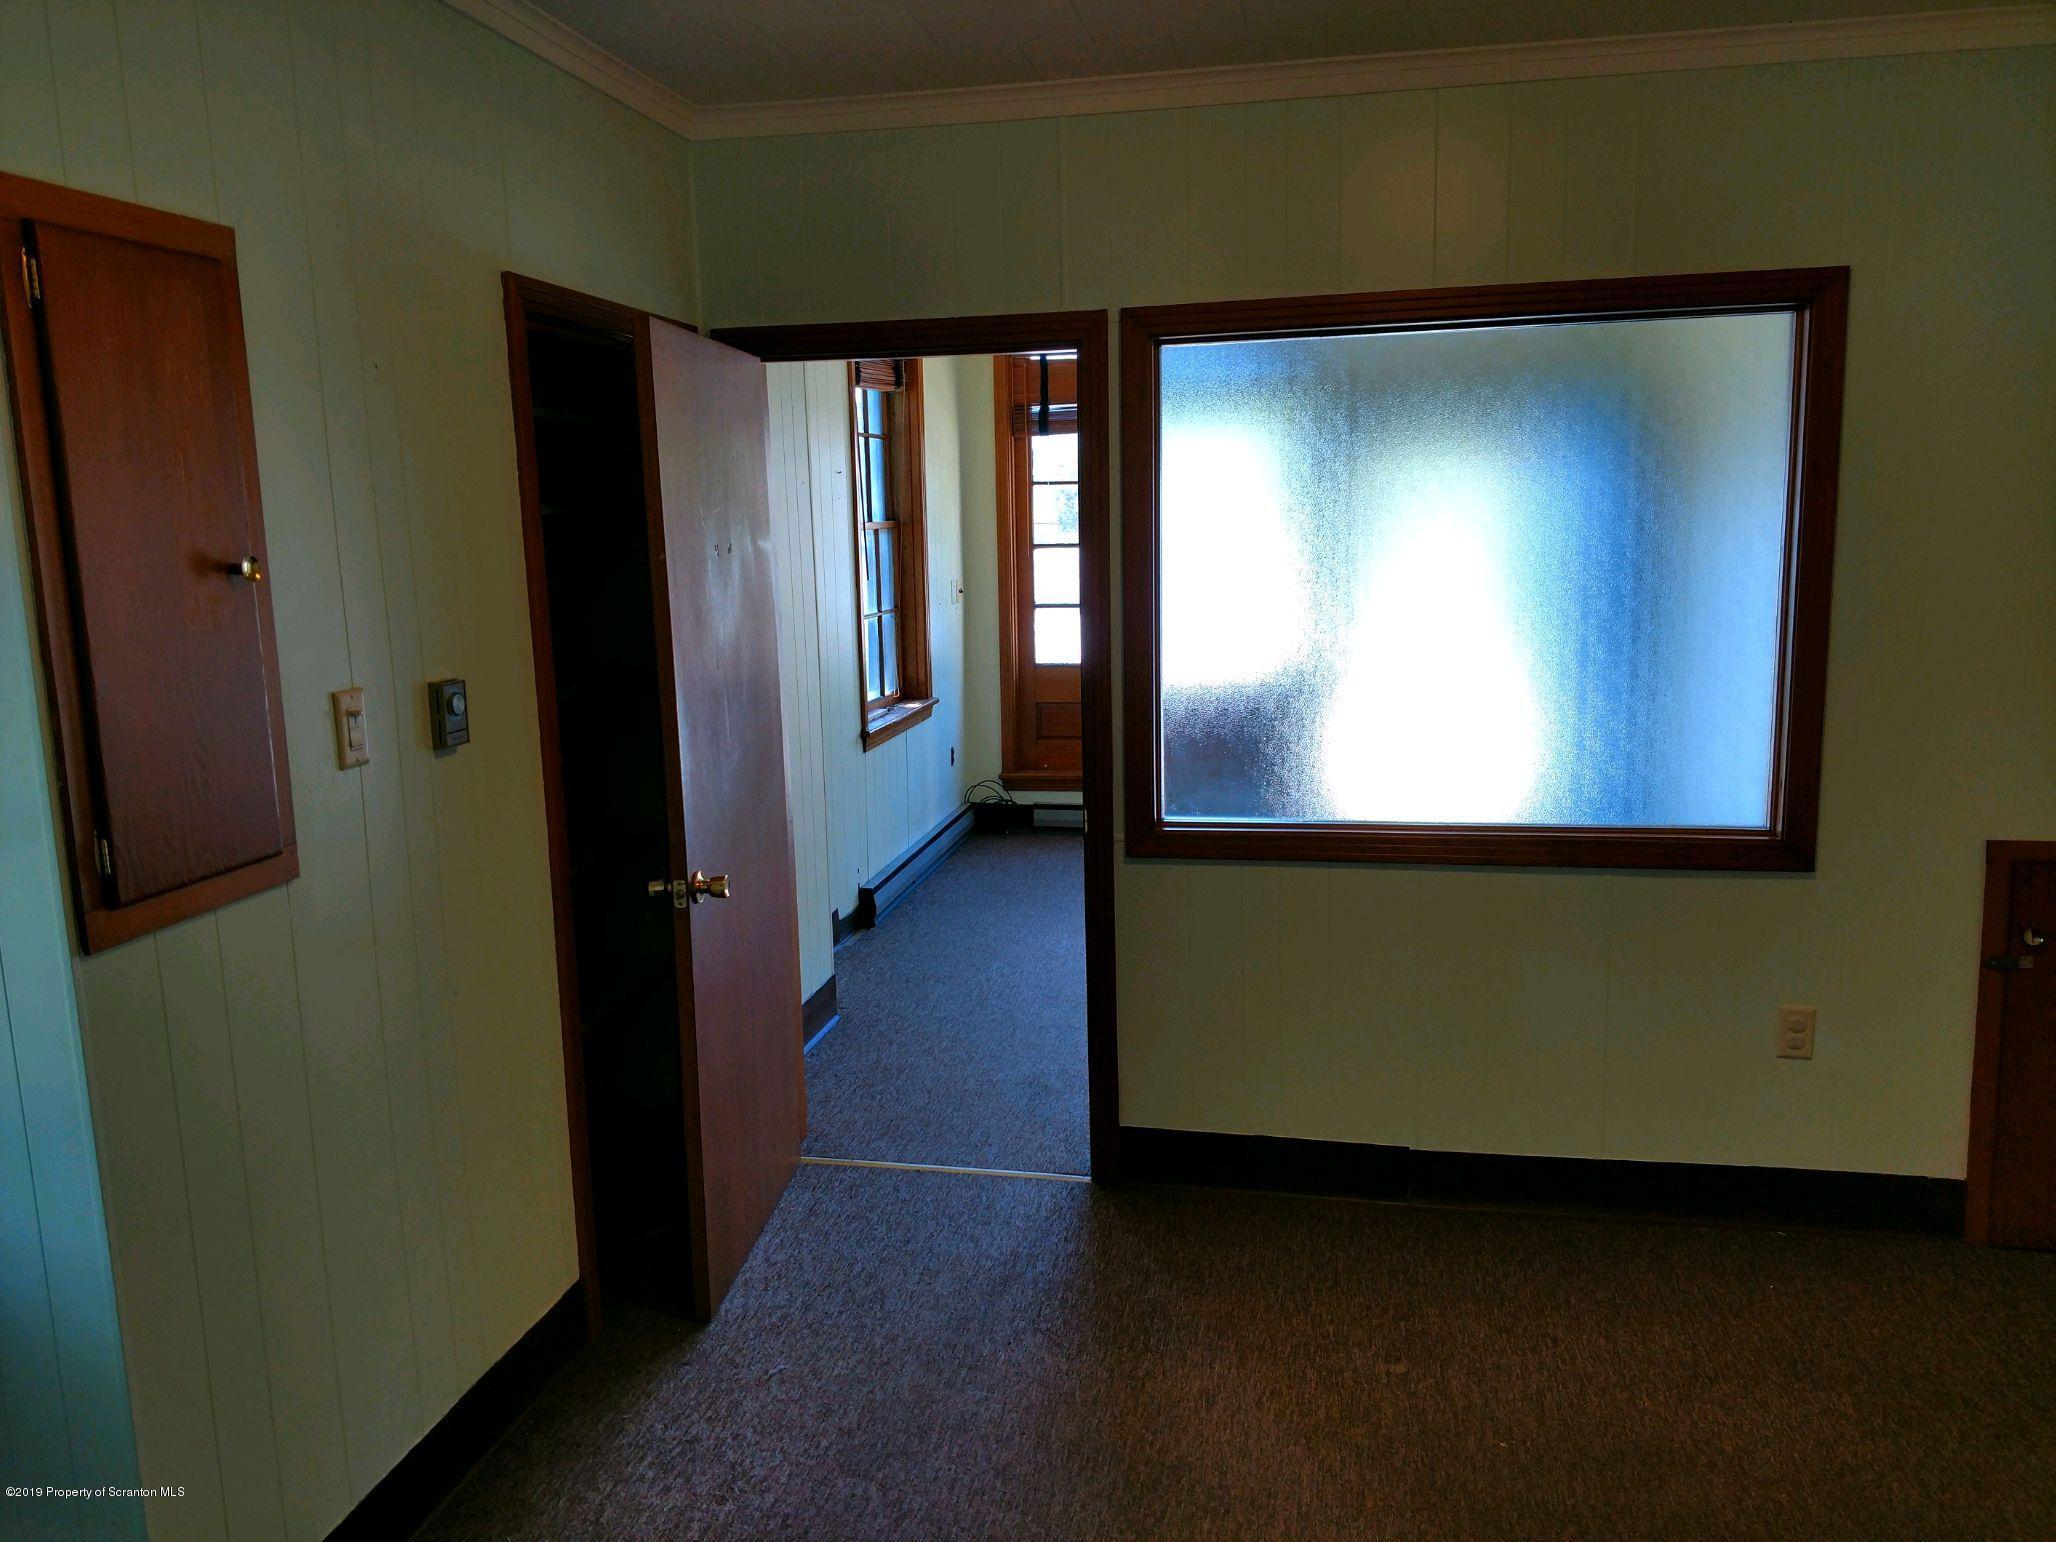 93 Warren St Unit #2, Tunkhannock, Pennsylvania 18657, ,1 BathroomBathrooms,Commercial,For Lease,Warren,19-2745